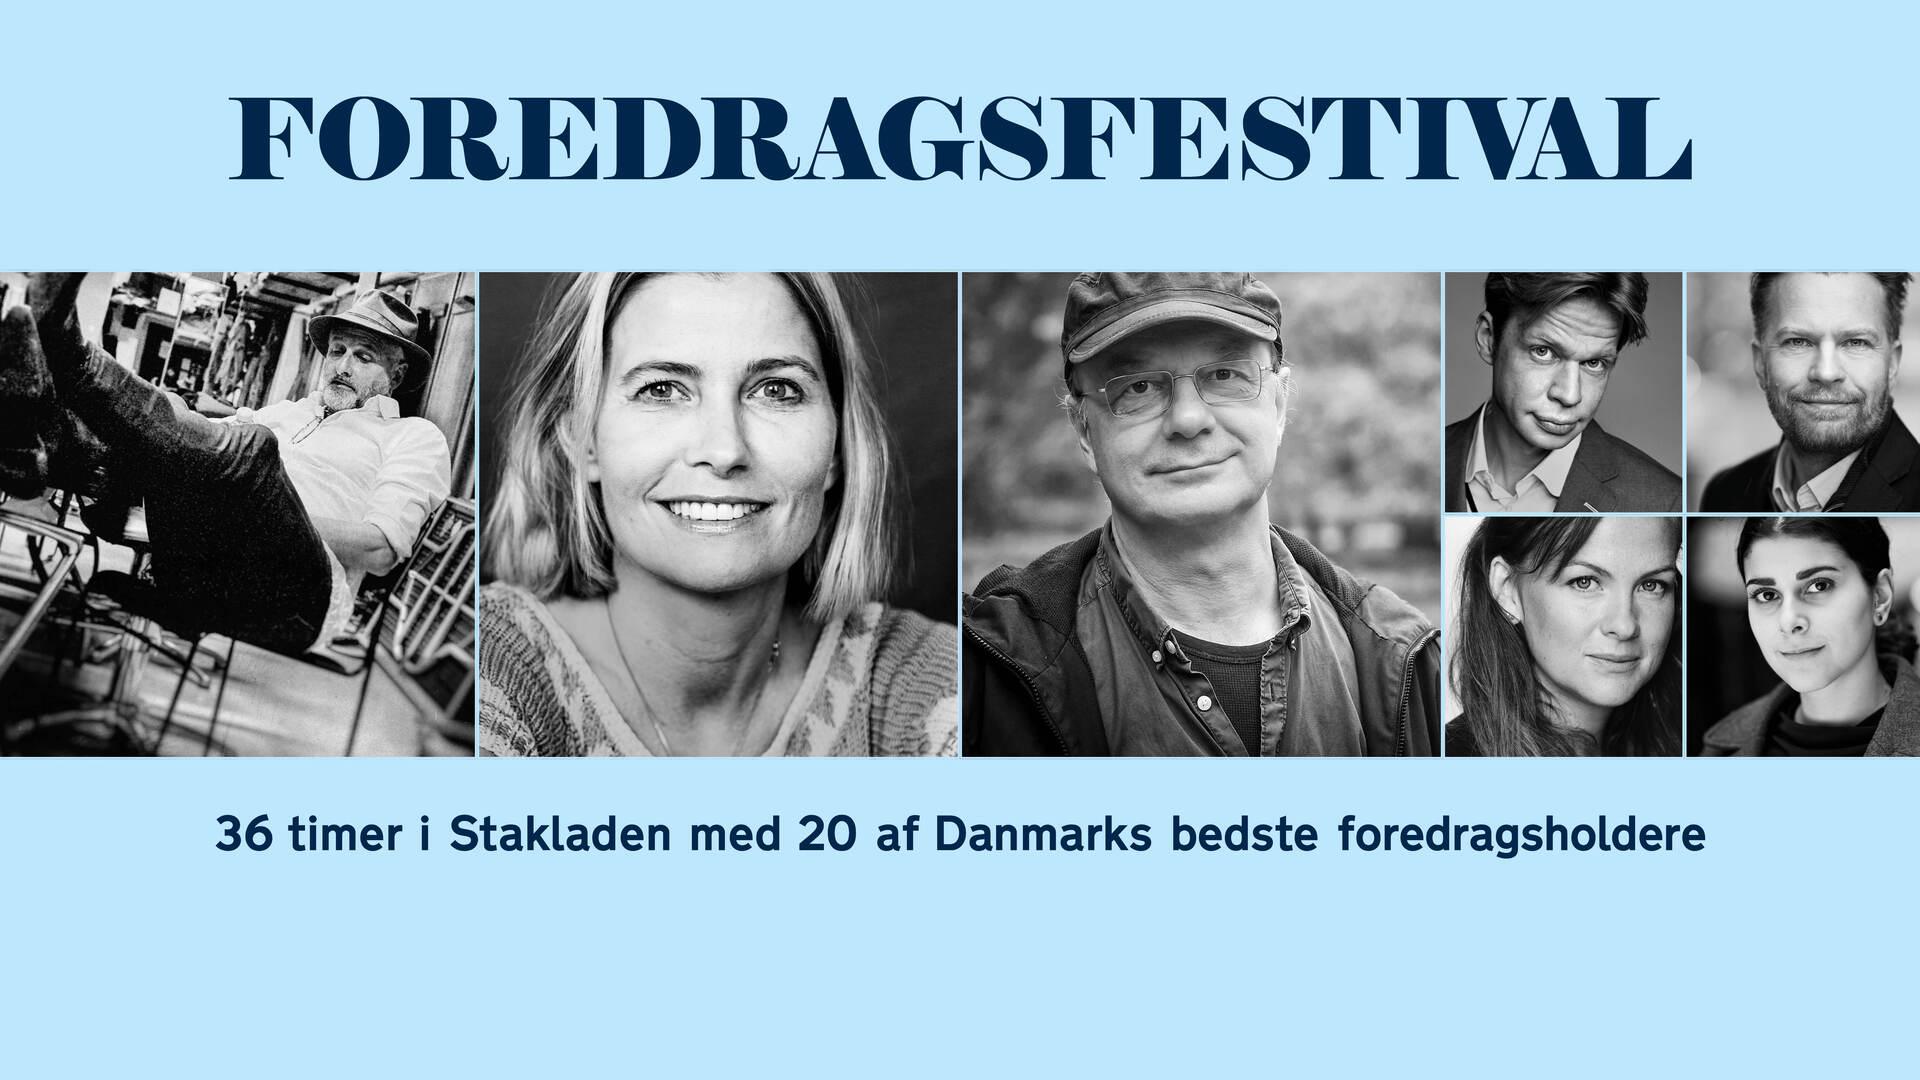 Danmarks nye Foredragsfestival i Aarhus: Premiere 24-25. november 2018